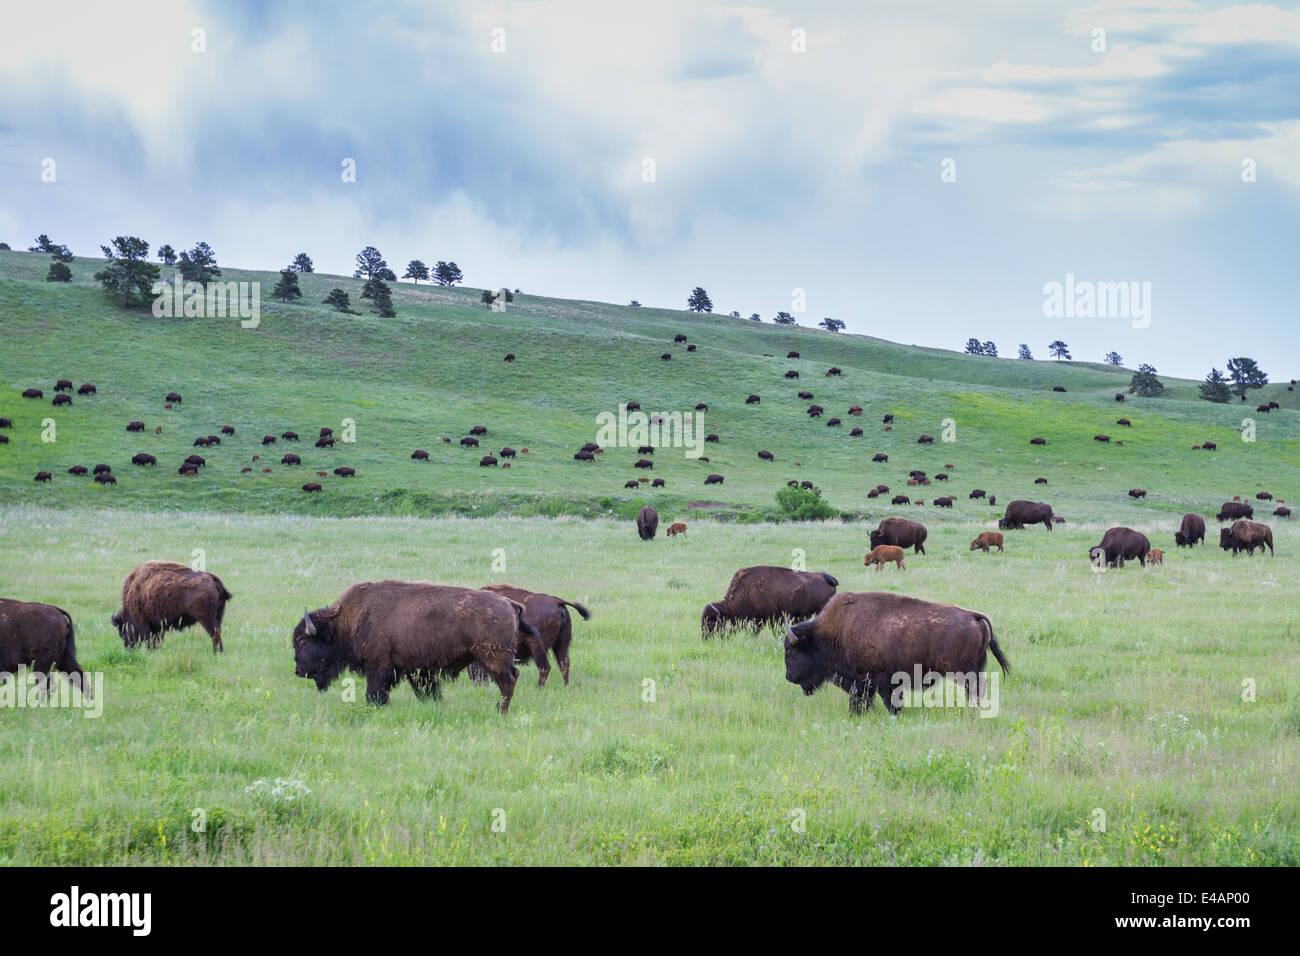 large wild american buffalo herd in the grasslands of South Dakota - Stock Image